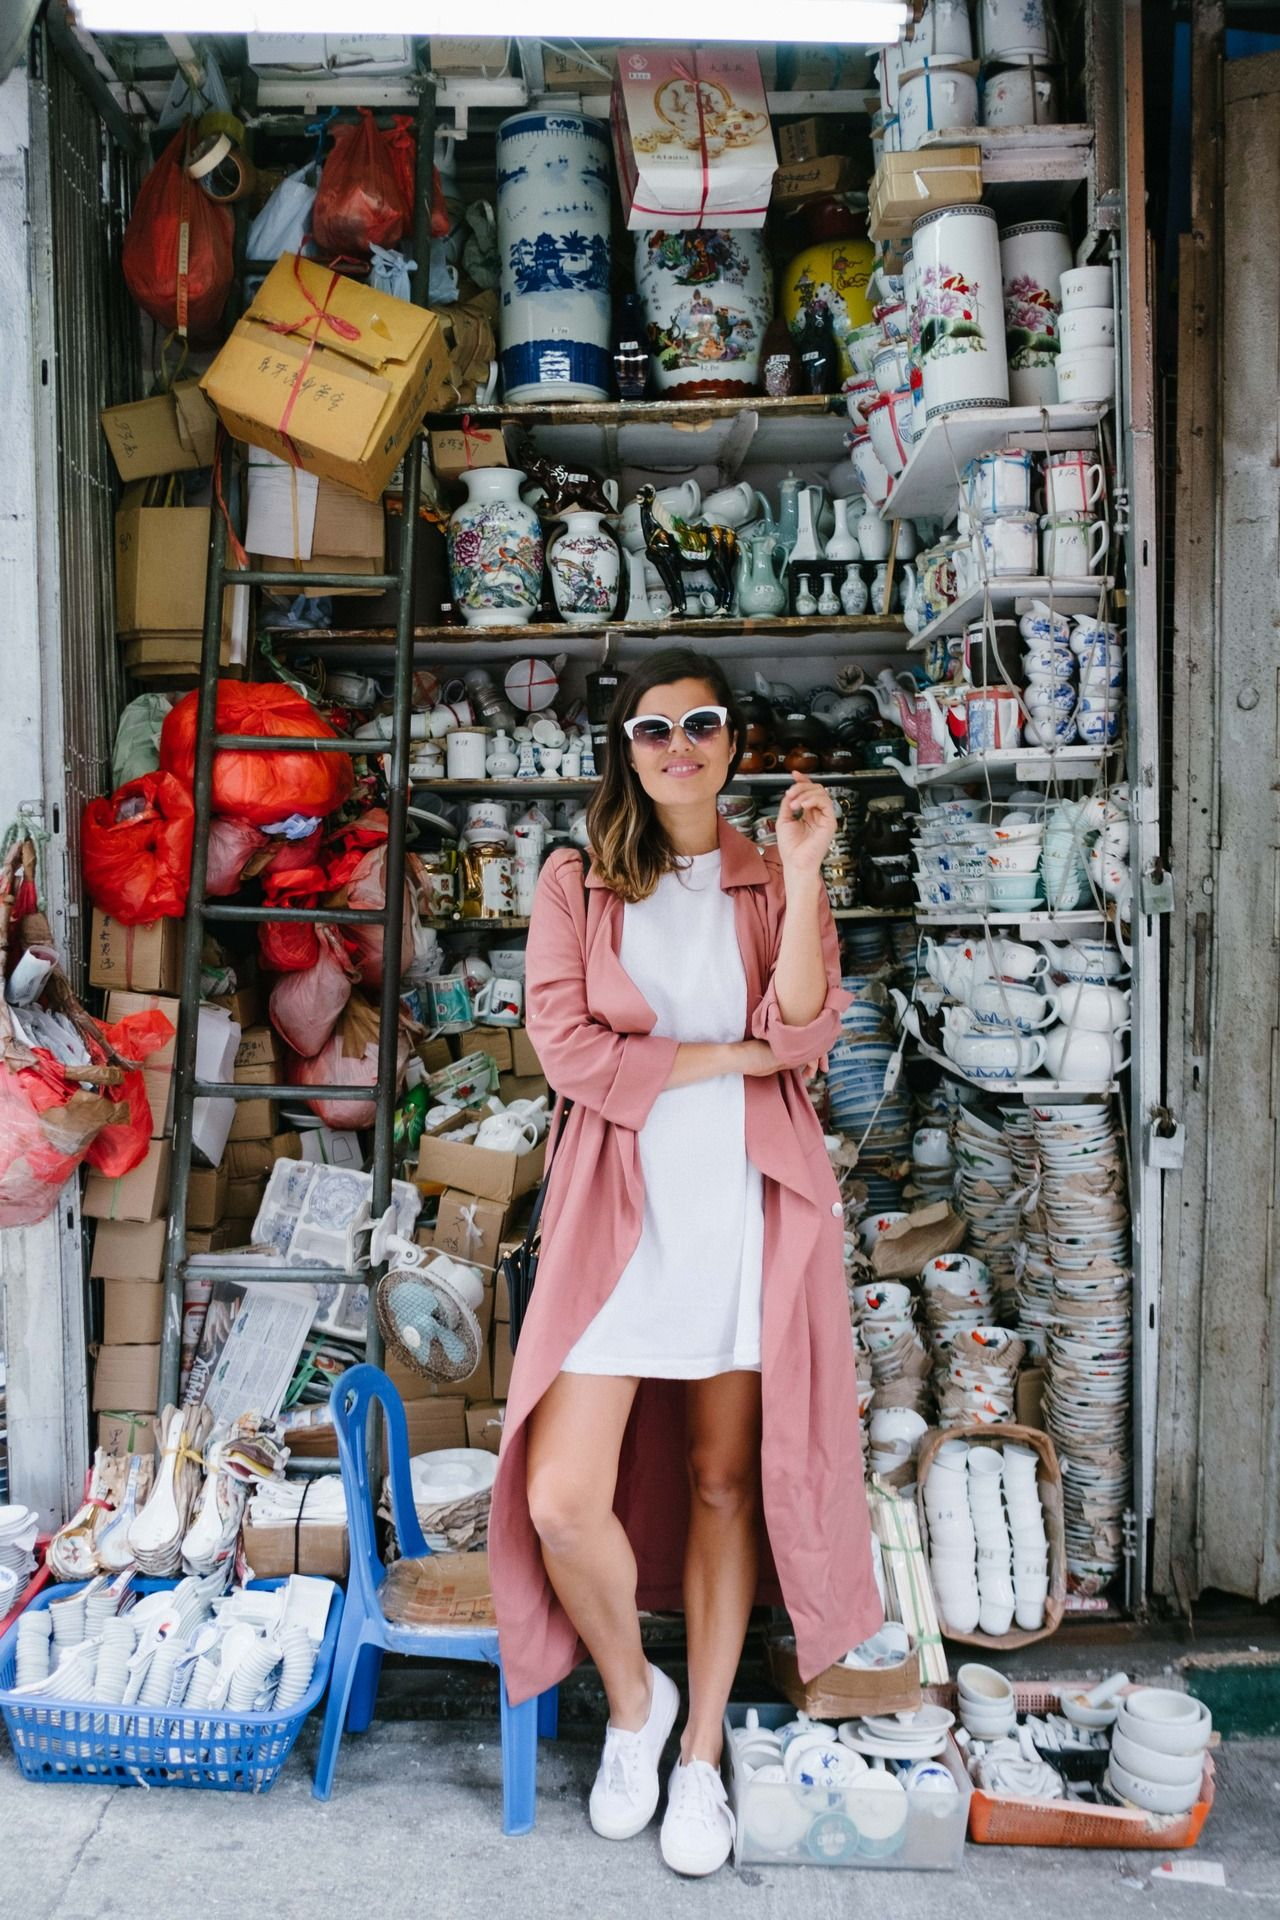 Hong Kong Travel Guide http://apairandasparediy.com/2017/03/hong-kong-guide-sai-ying-pun-kennedy-town/